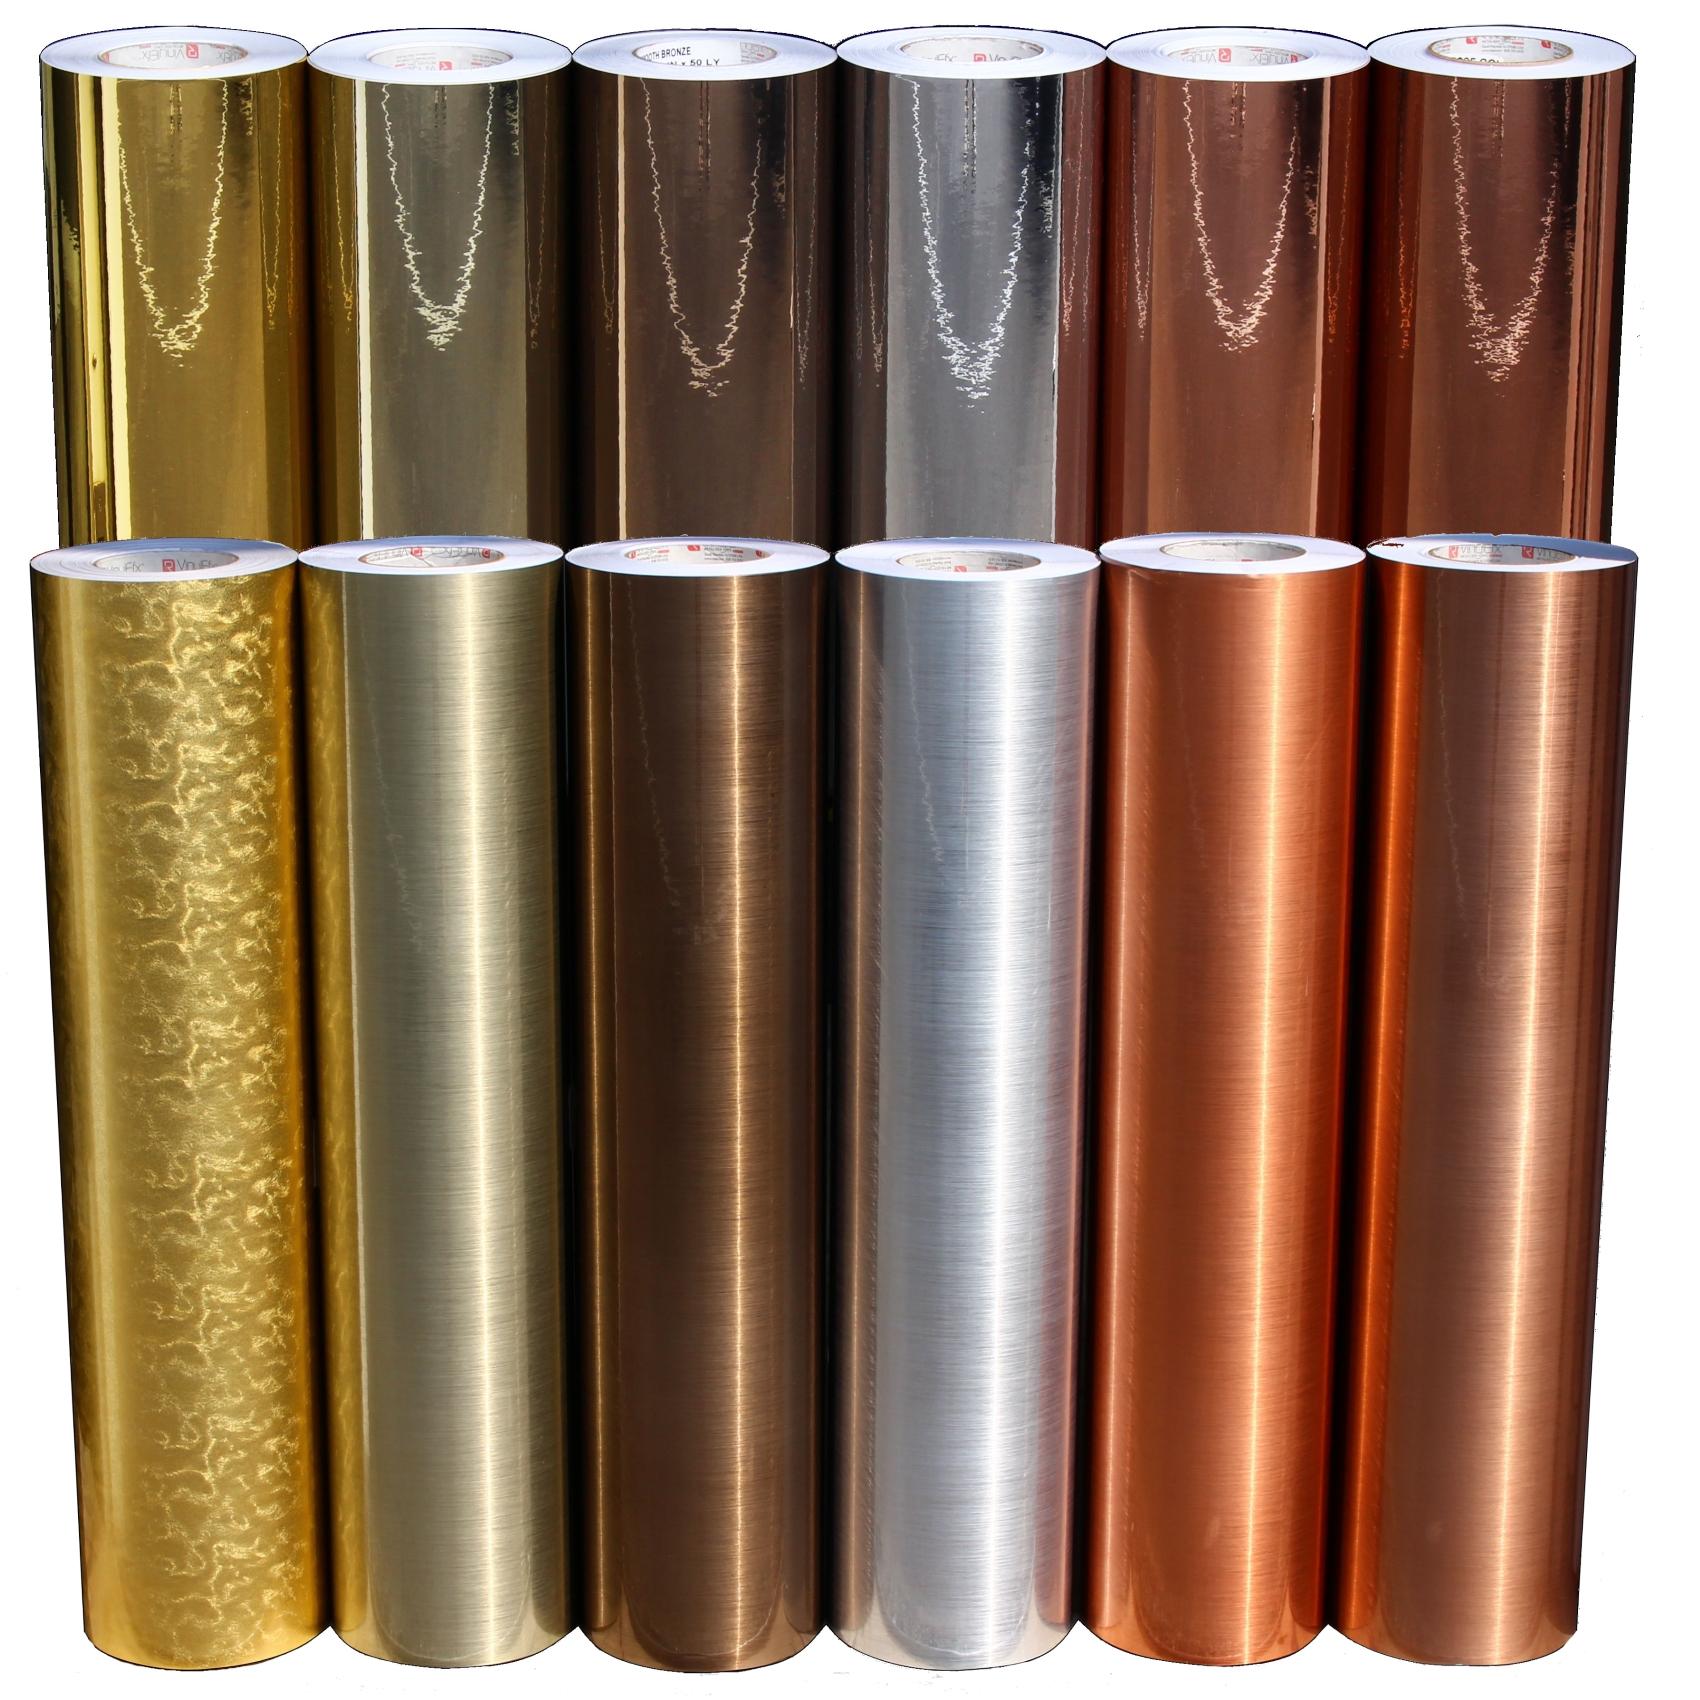 19-49-26-20-m-Plotterfolie-Hologramm-Oilslick-Folie-Aufkleber-Plottfolie Indexbild 48